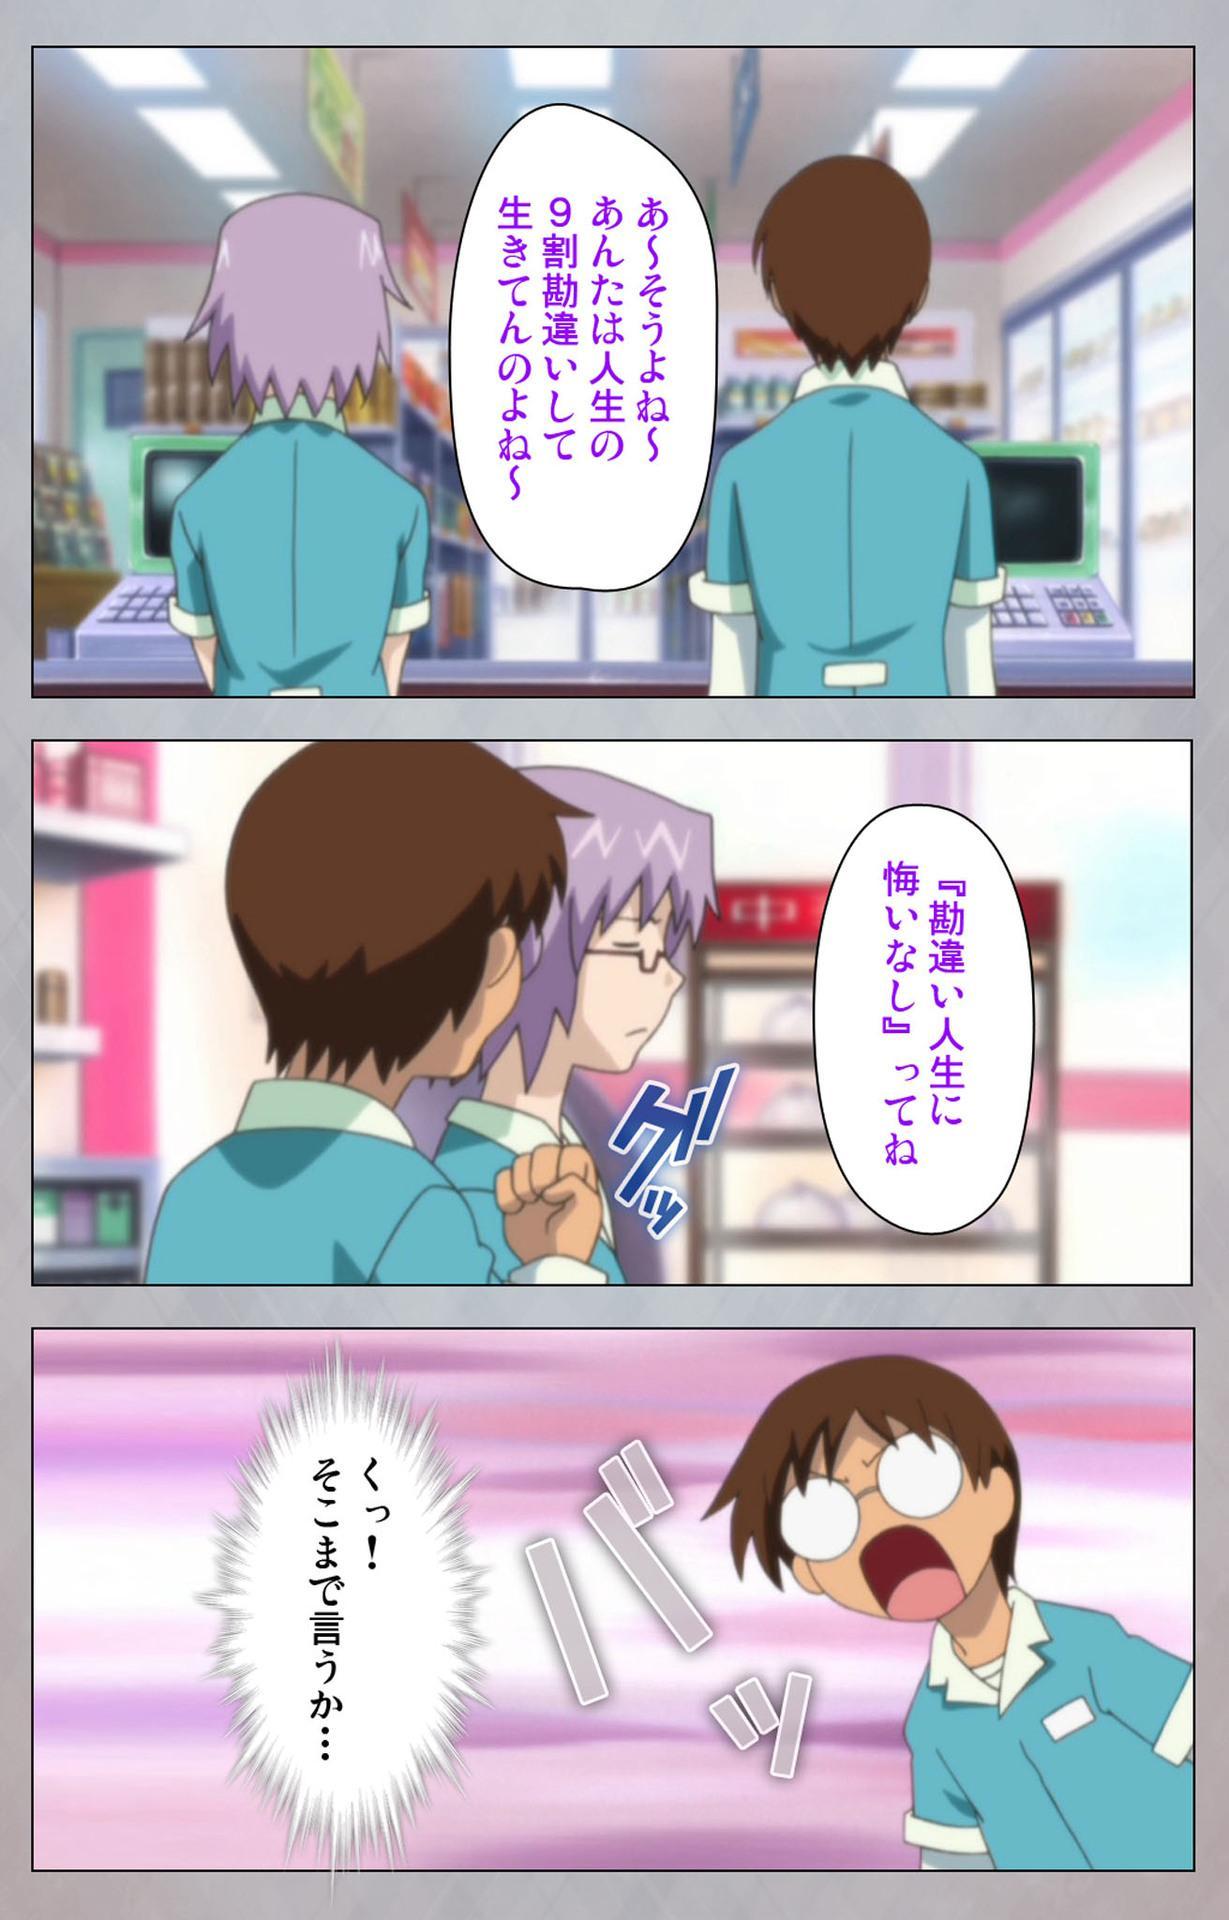 [Digital Works] [Full Color Seijin Ban] Sex Android ~Risou no Onna de Nuite yaru~ Kanzenban 8